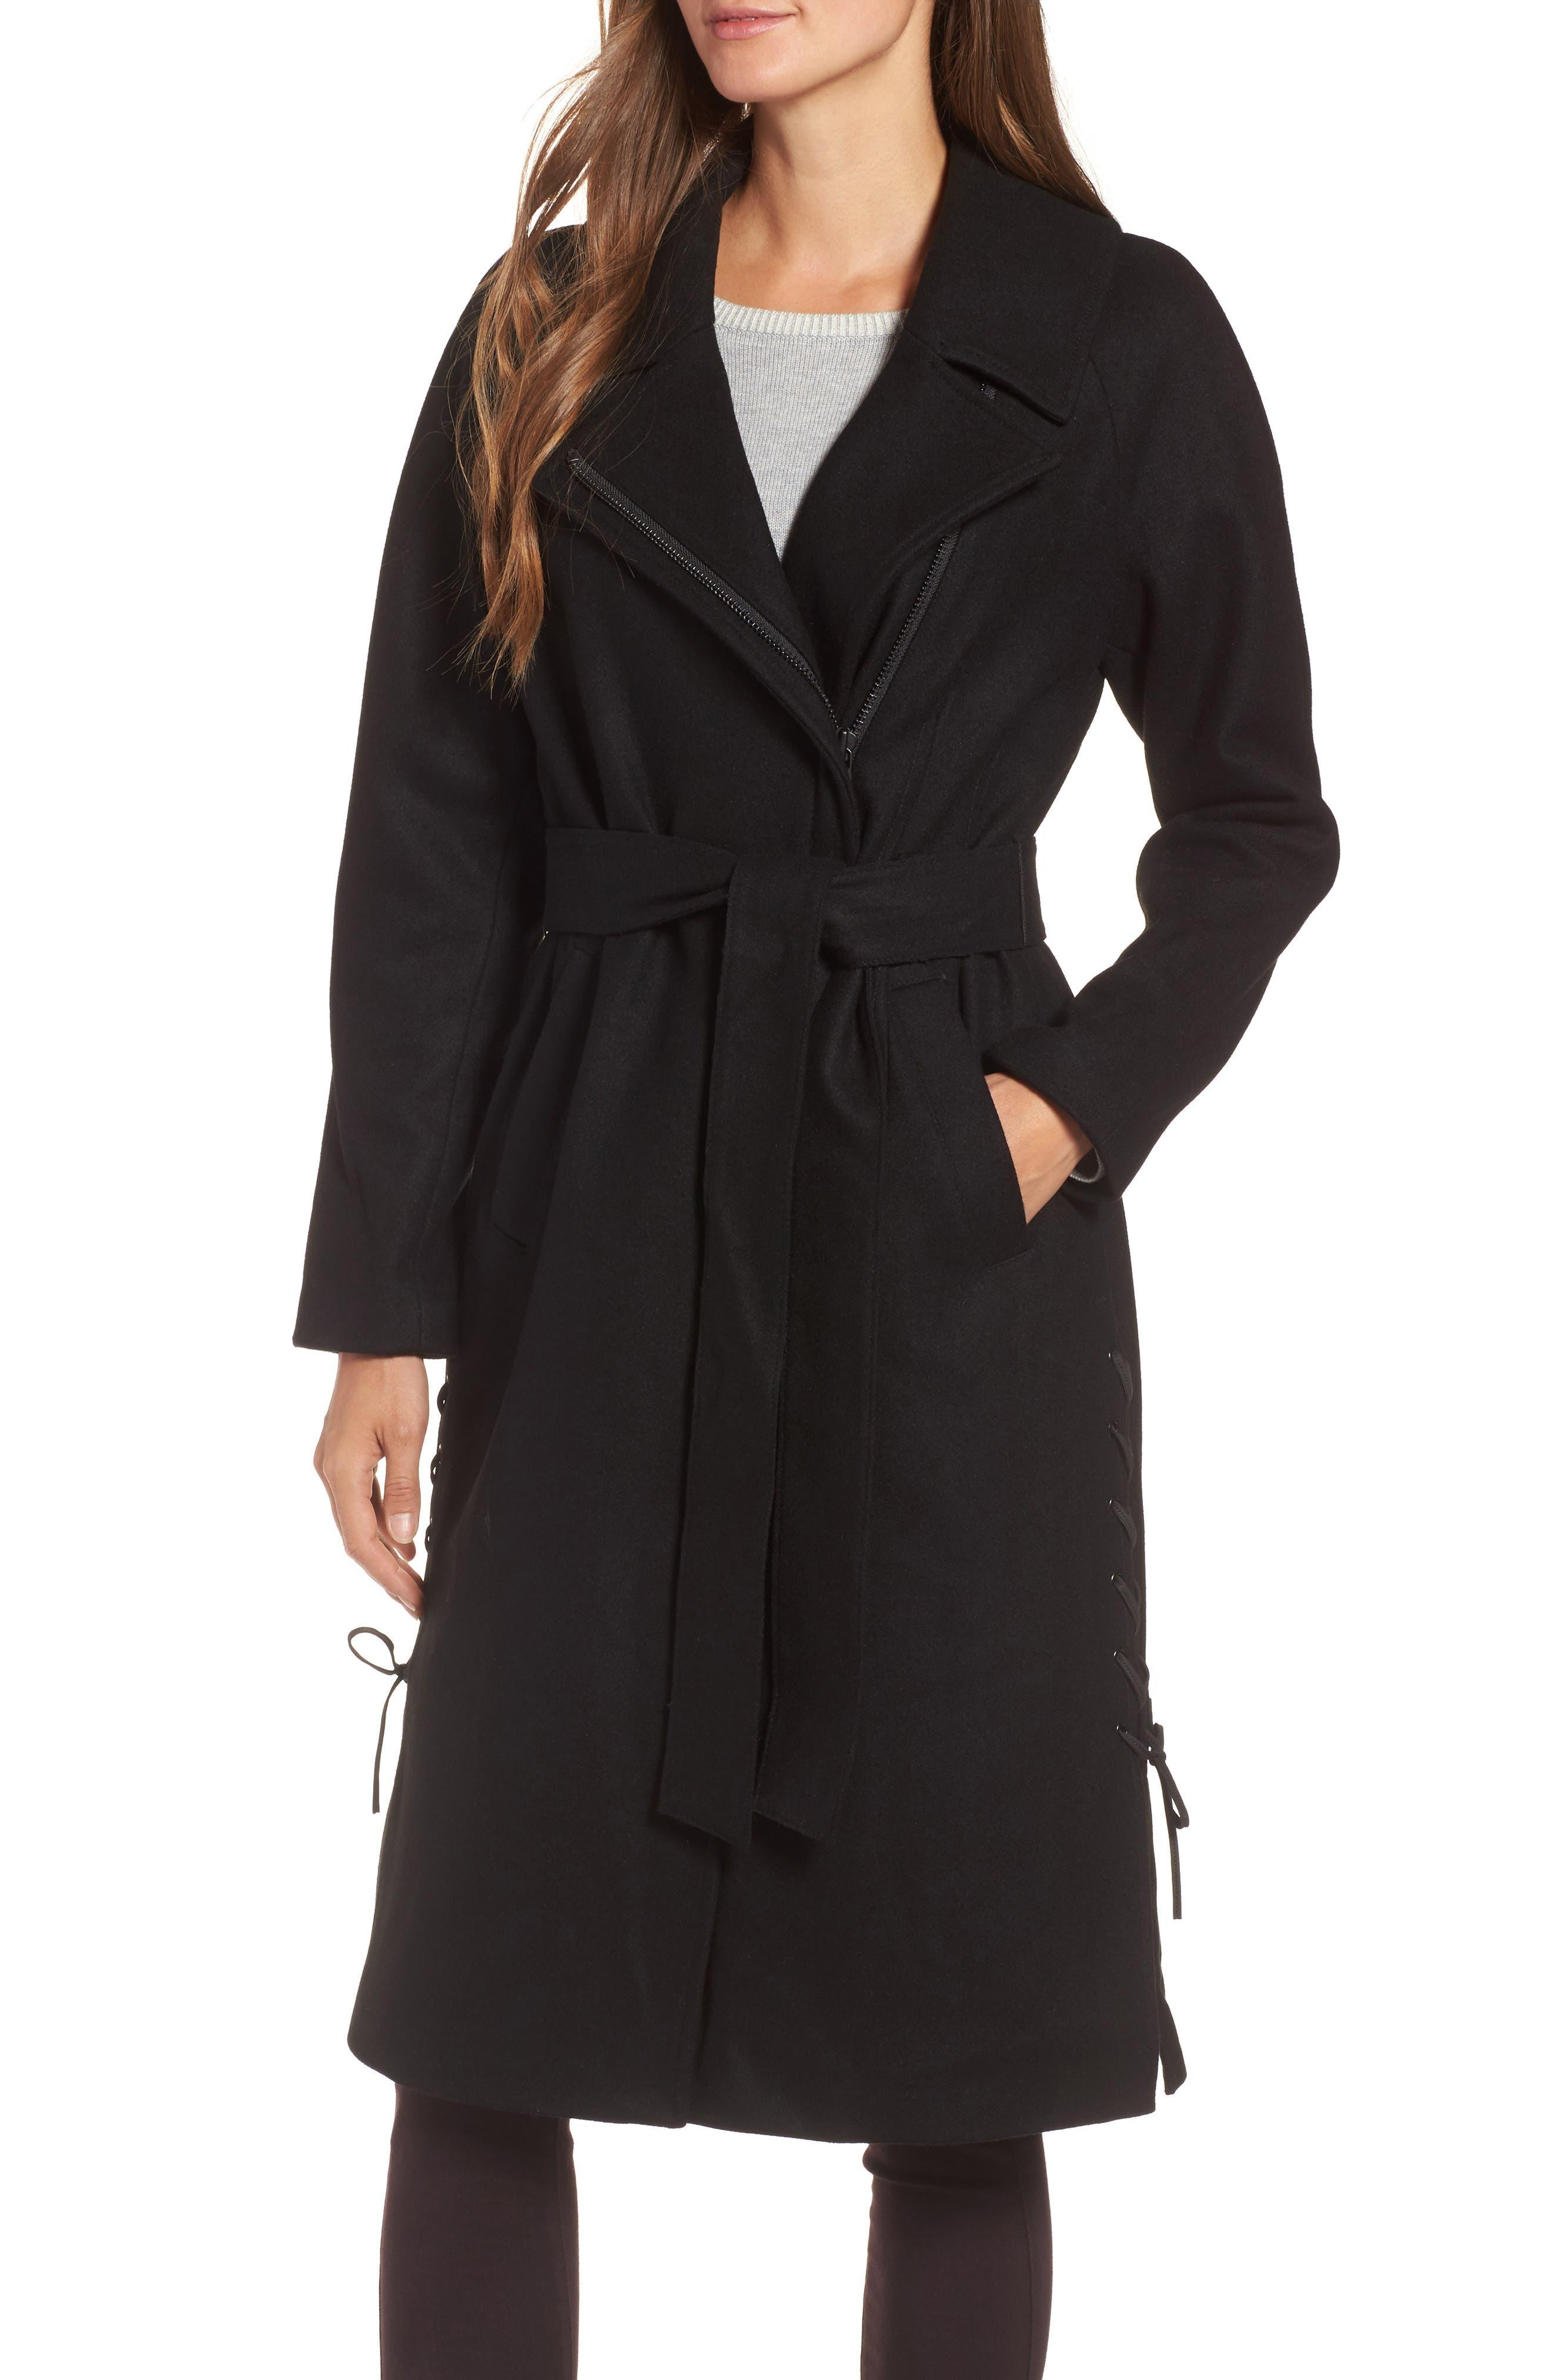 Main Image - Andrew Marc Baylee Asymmetrical Wool Blend Coat